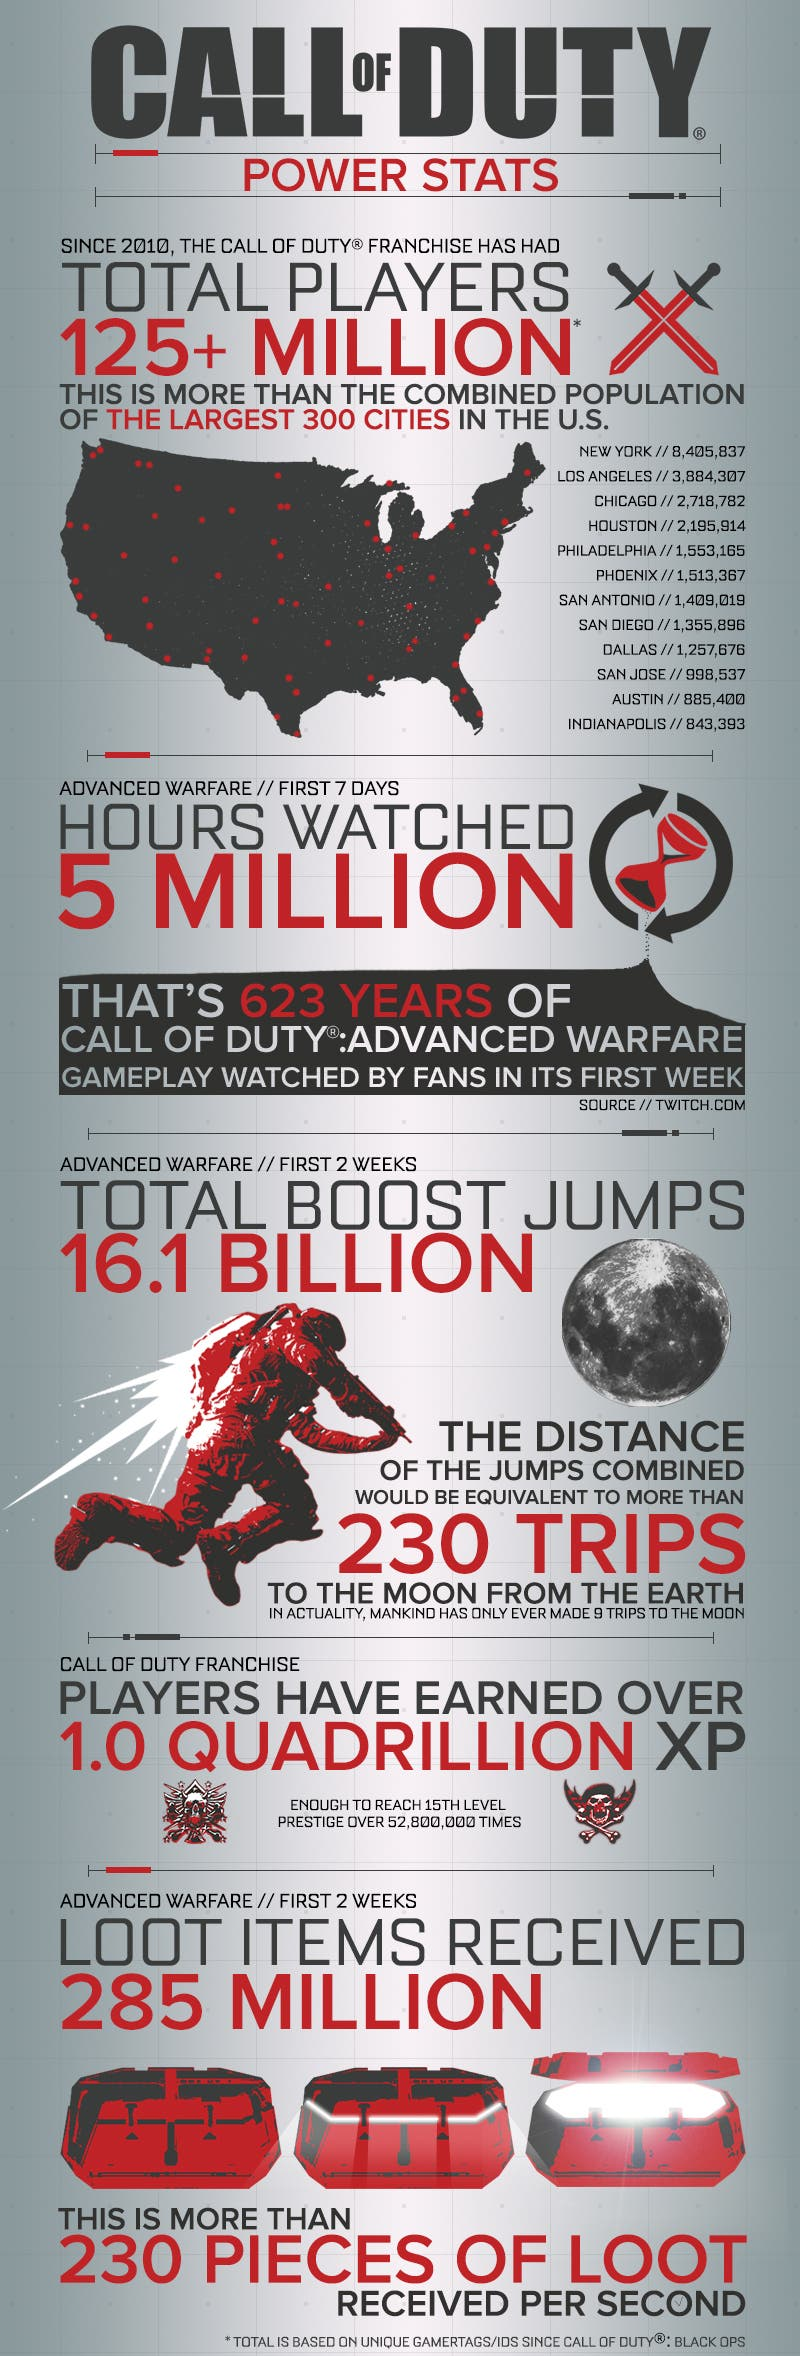 7135_d20141105-004_CoD_2014_Infographic_Final